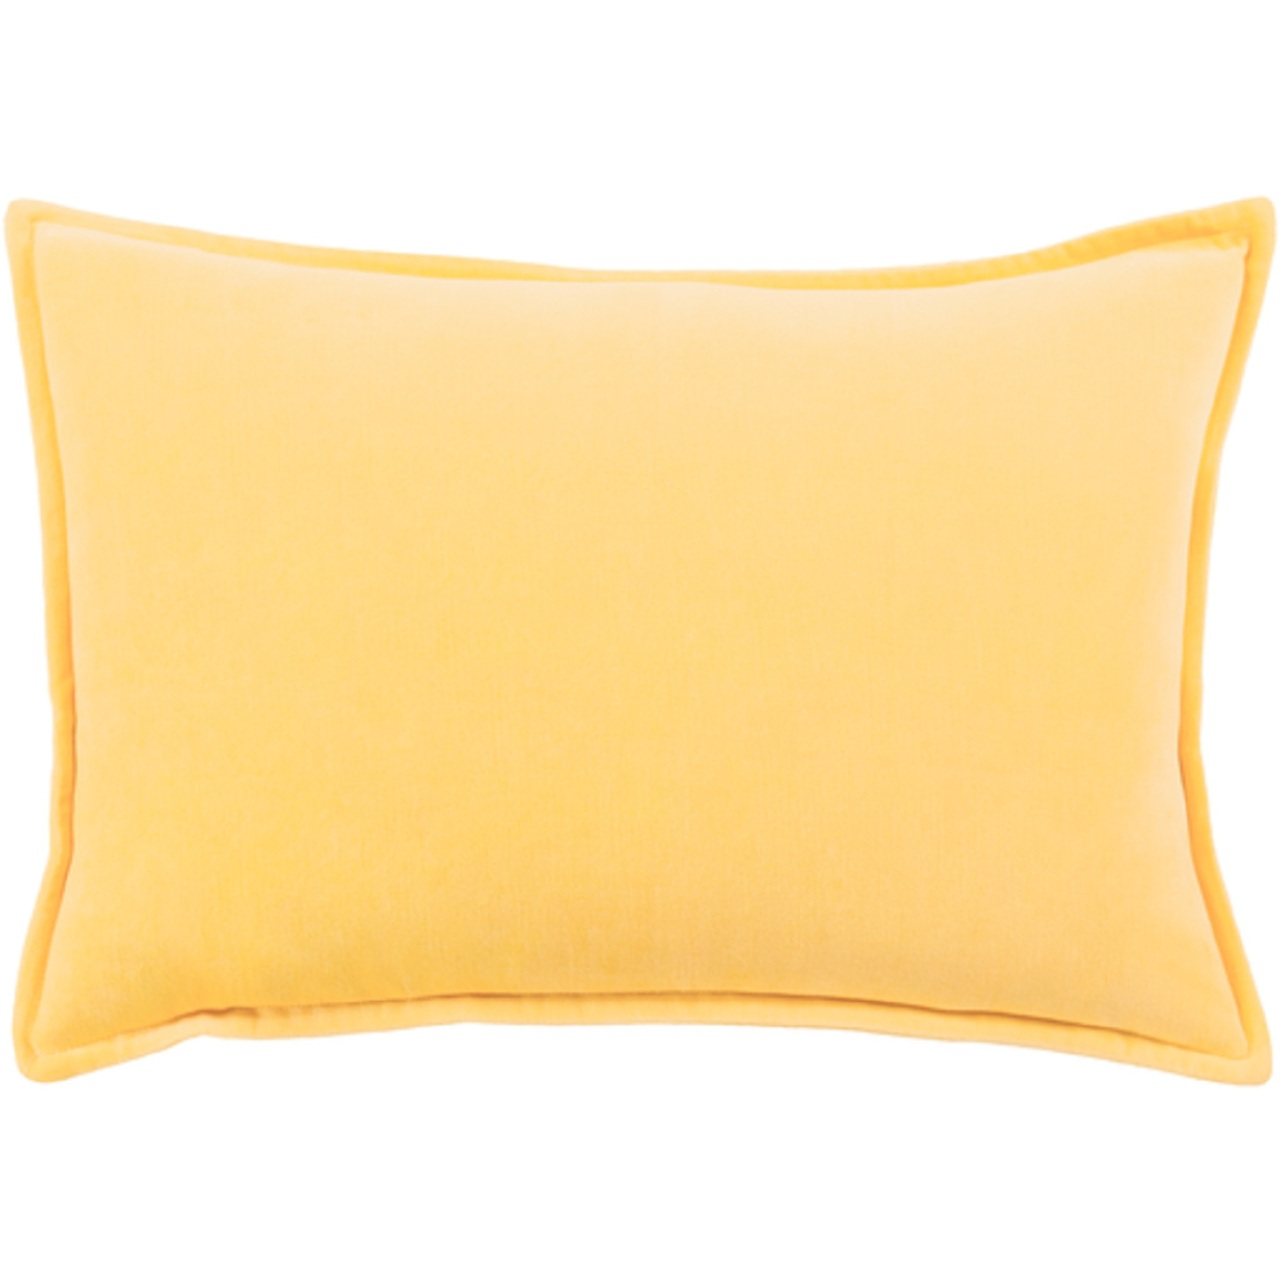 Goldenrod Throw Pillow : 13? x 19